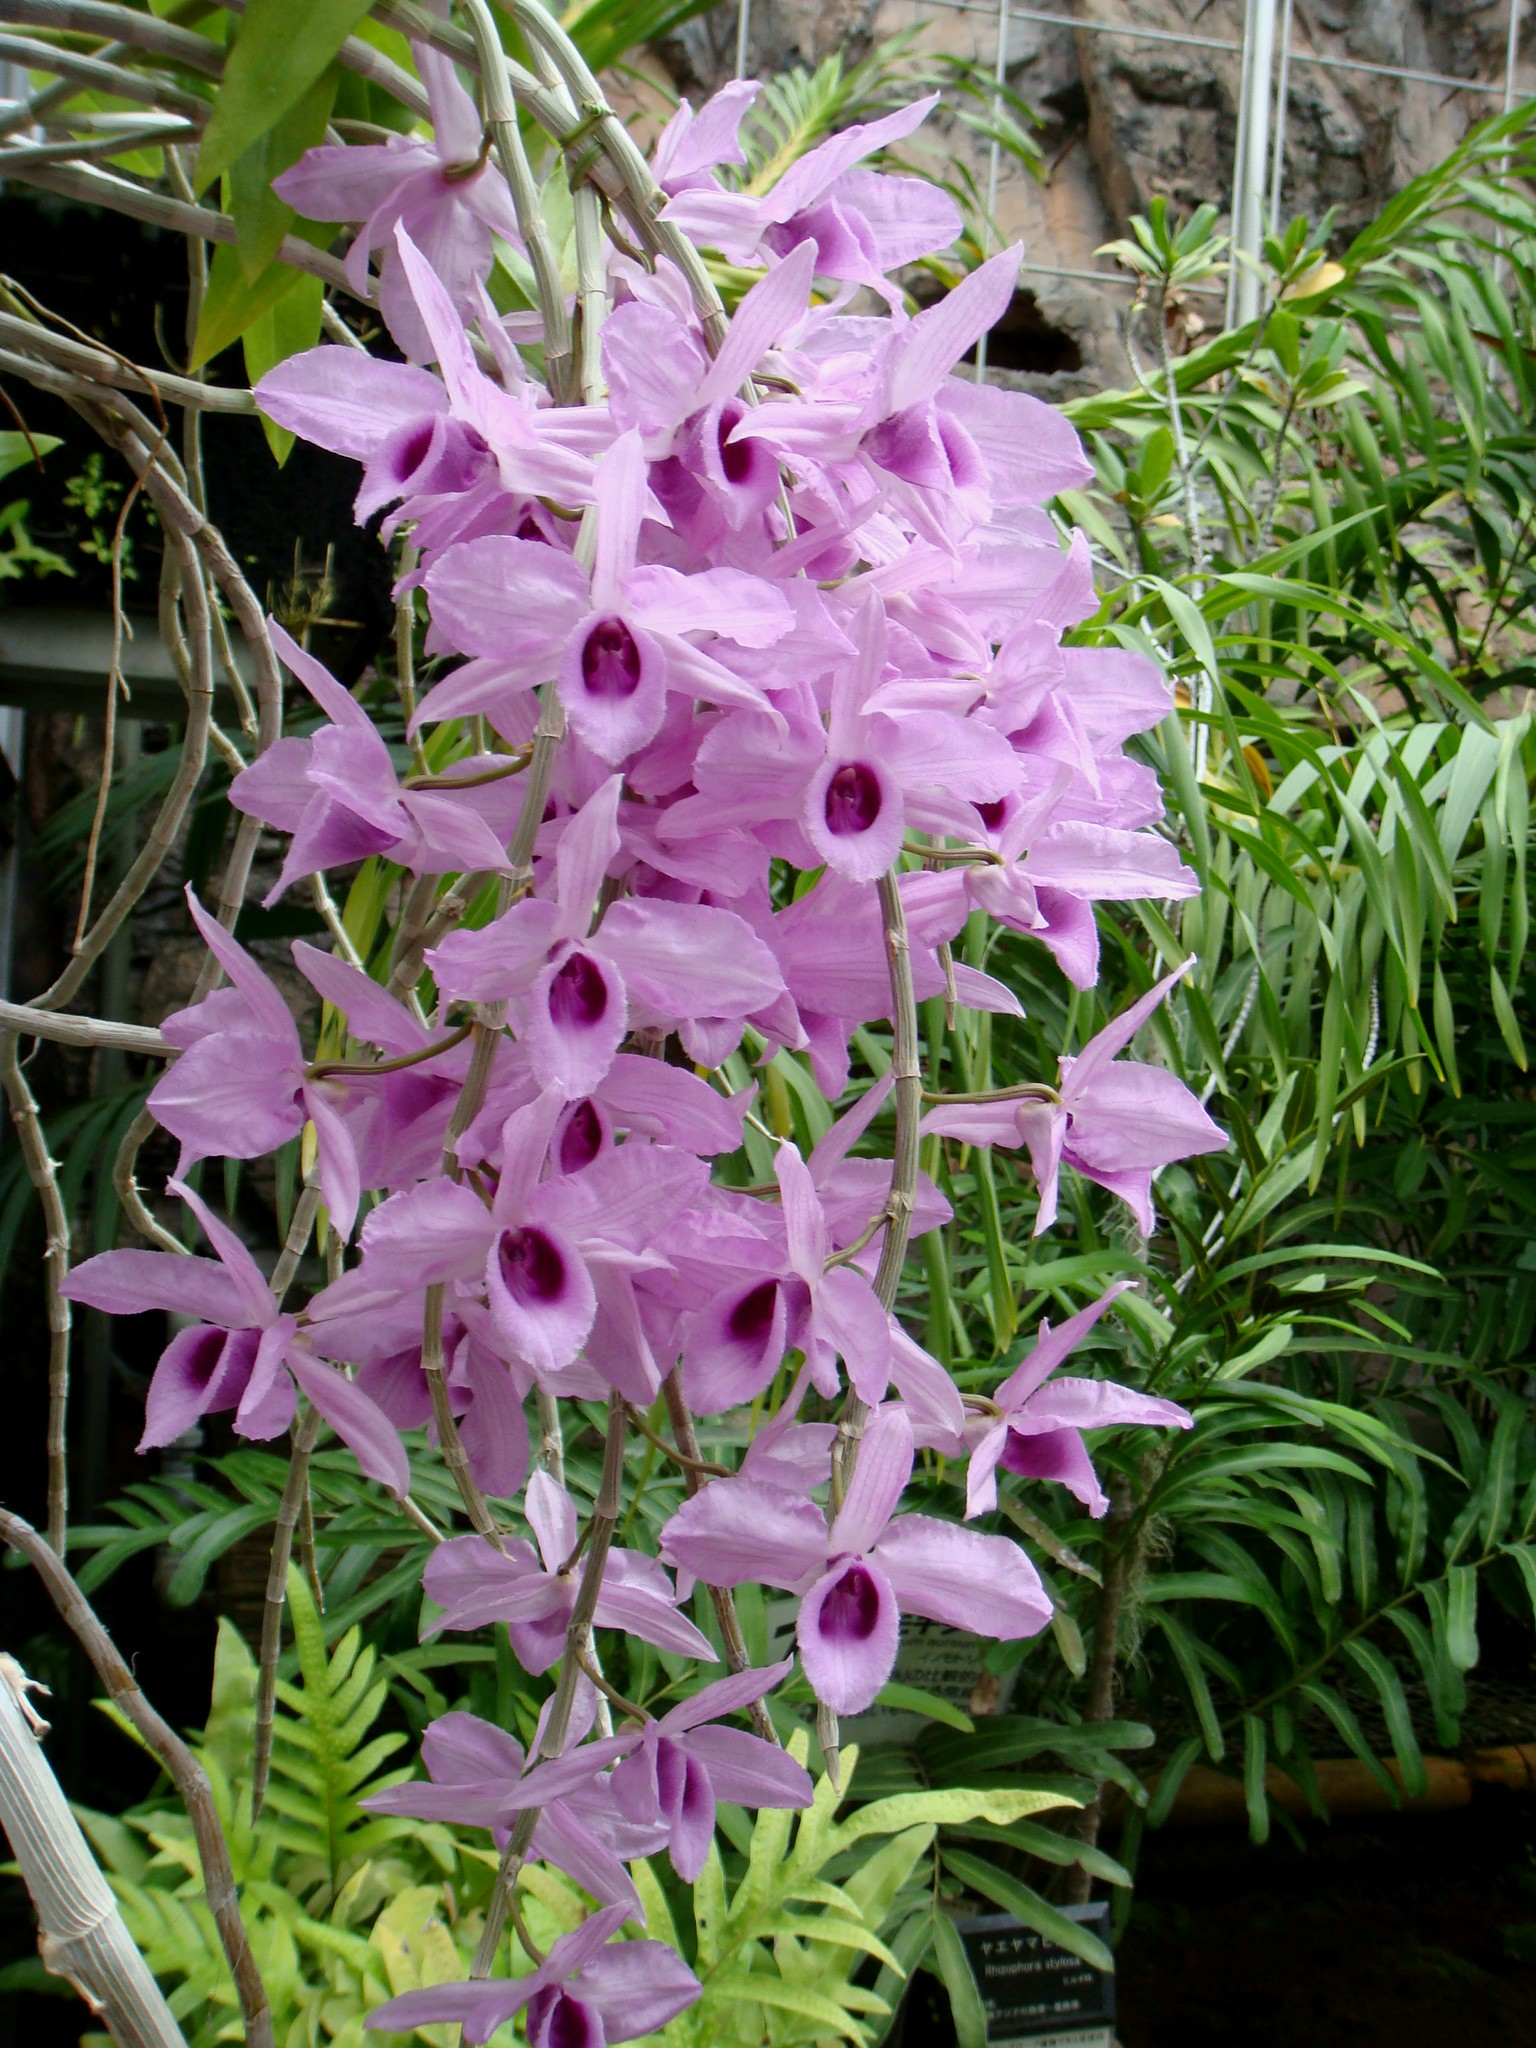 http://orchids.la.coocan.jp/Dendrobium/Dendrobium%20anosmum/DSC06679.JPG